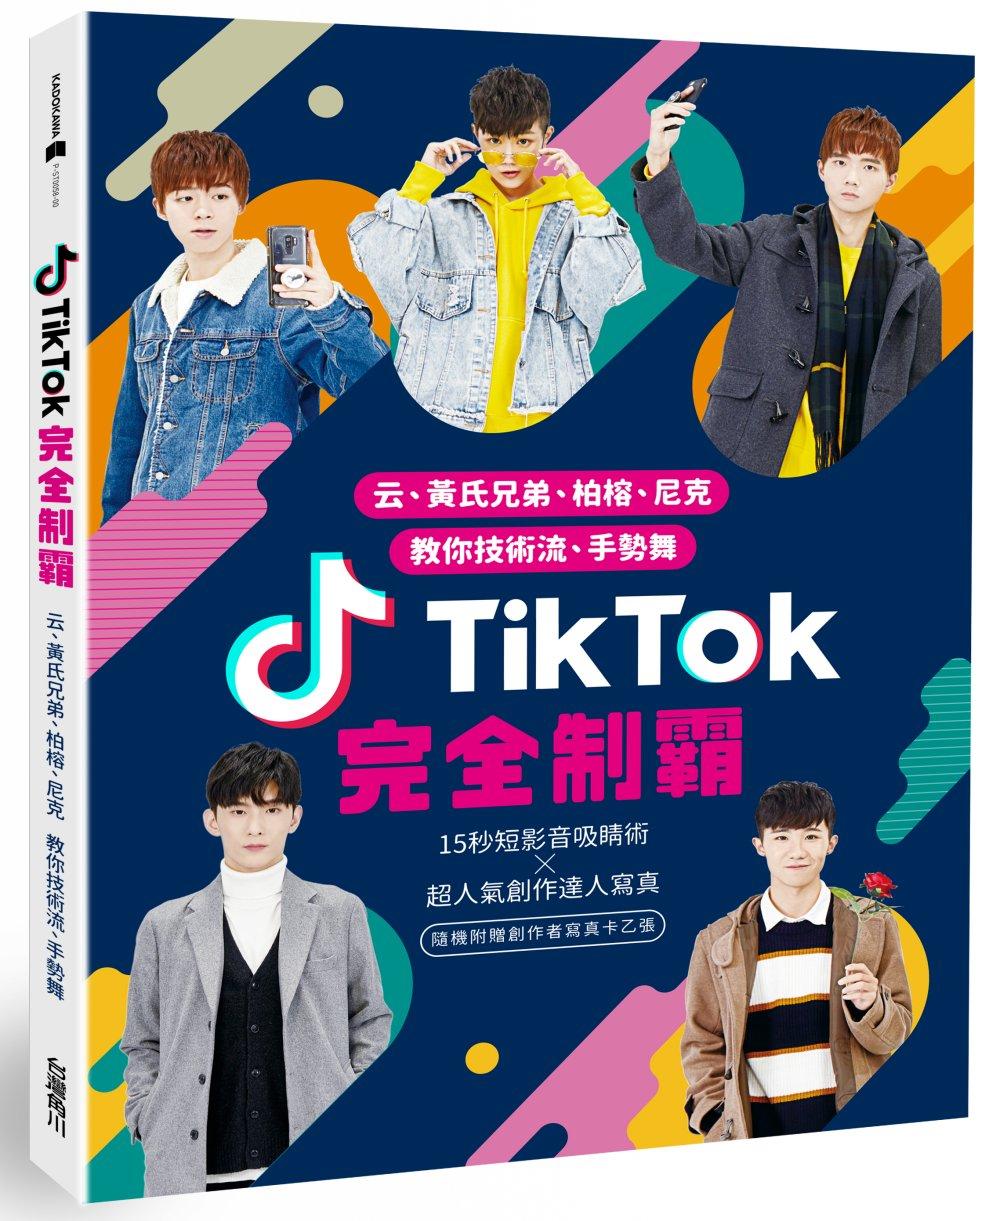 TikTok(抖音)完全制霸:云、黃氏兄弟、柏榕、尼克 教你技術流、手勢舞